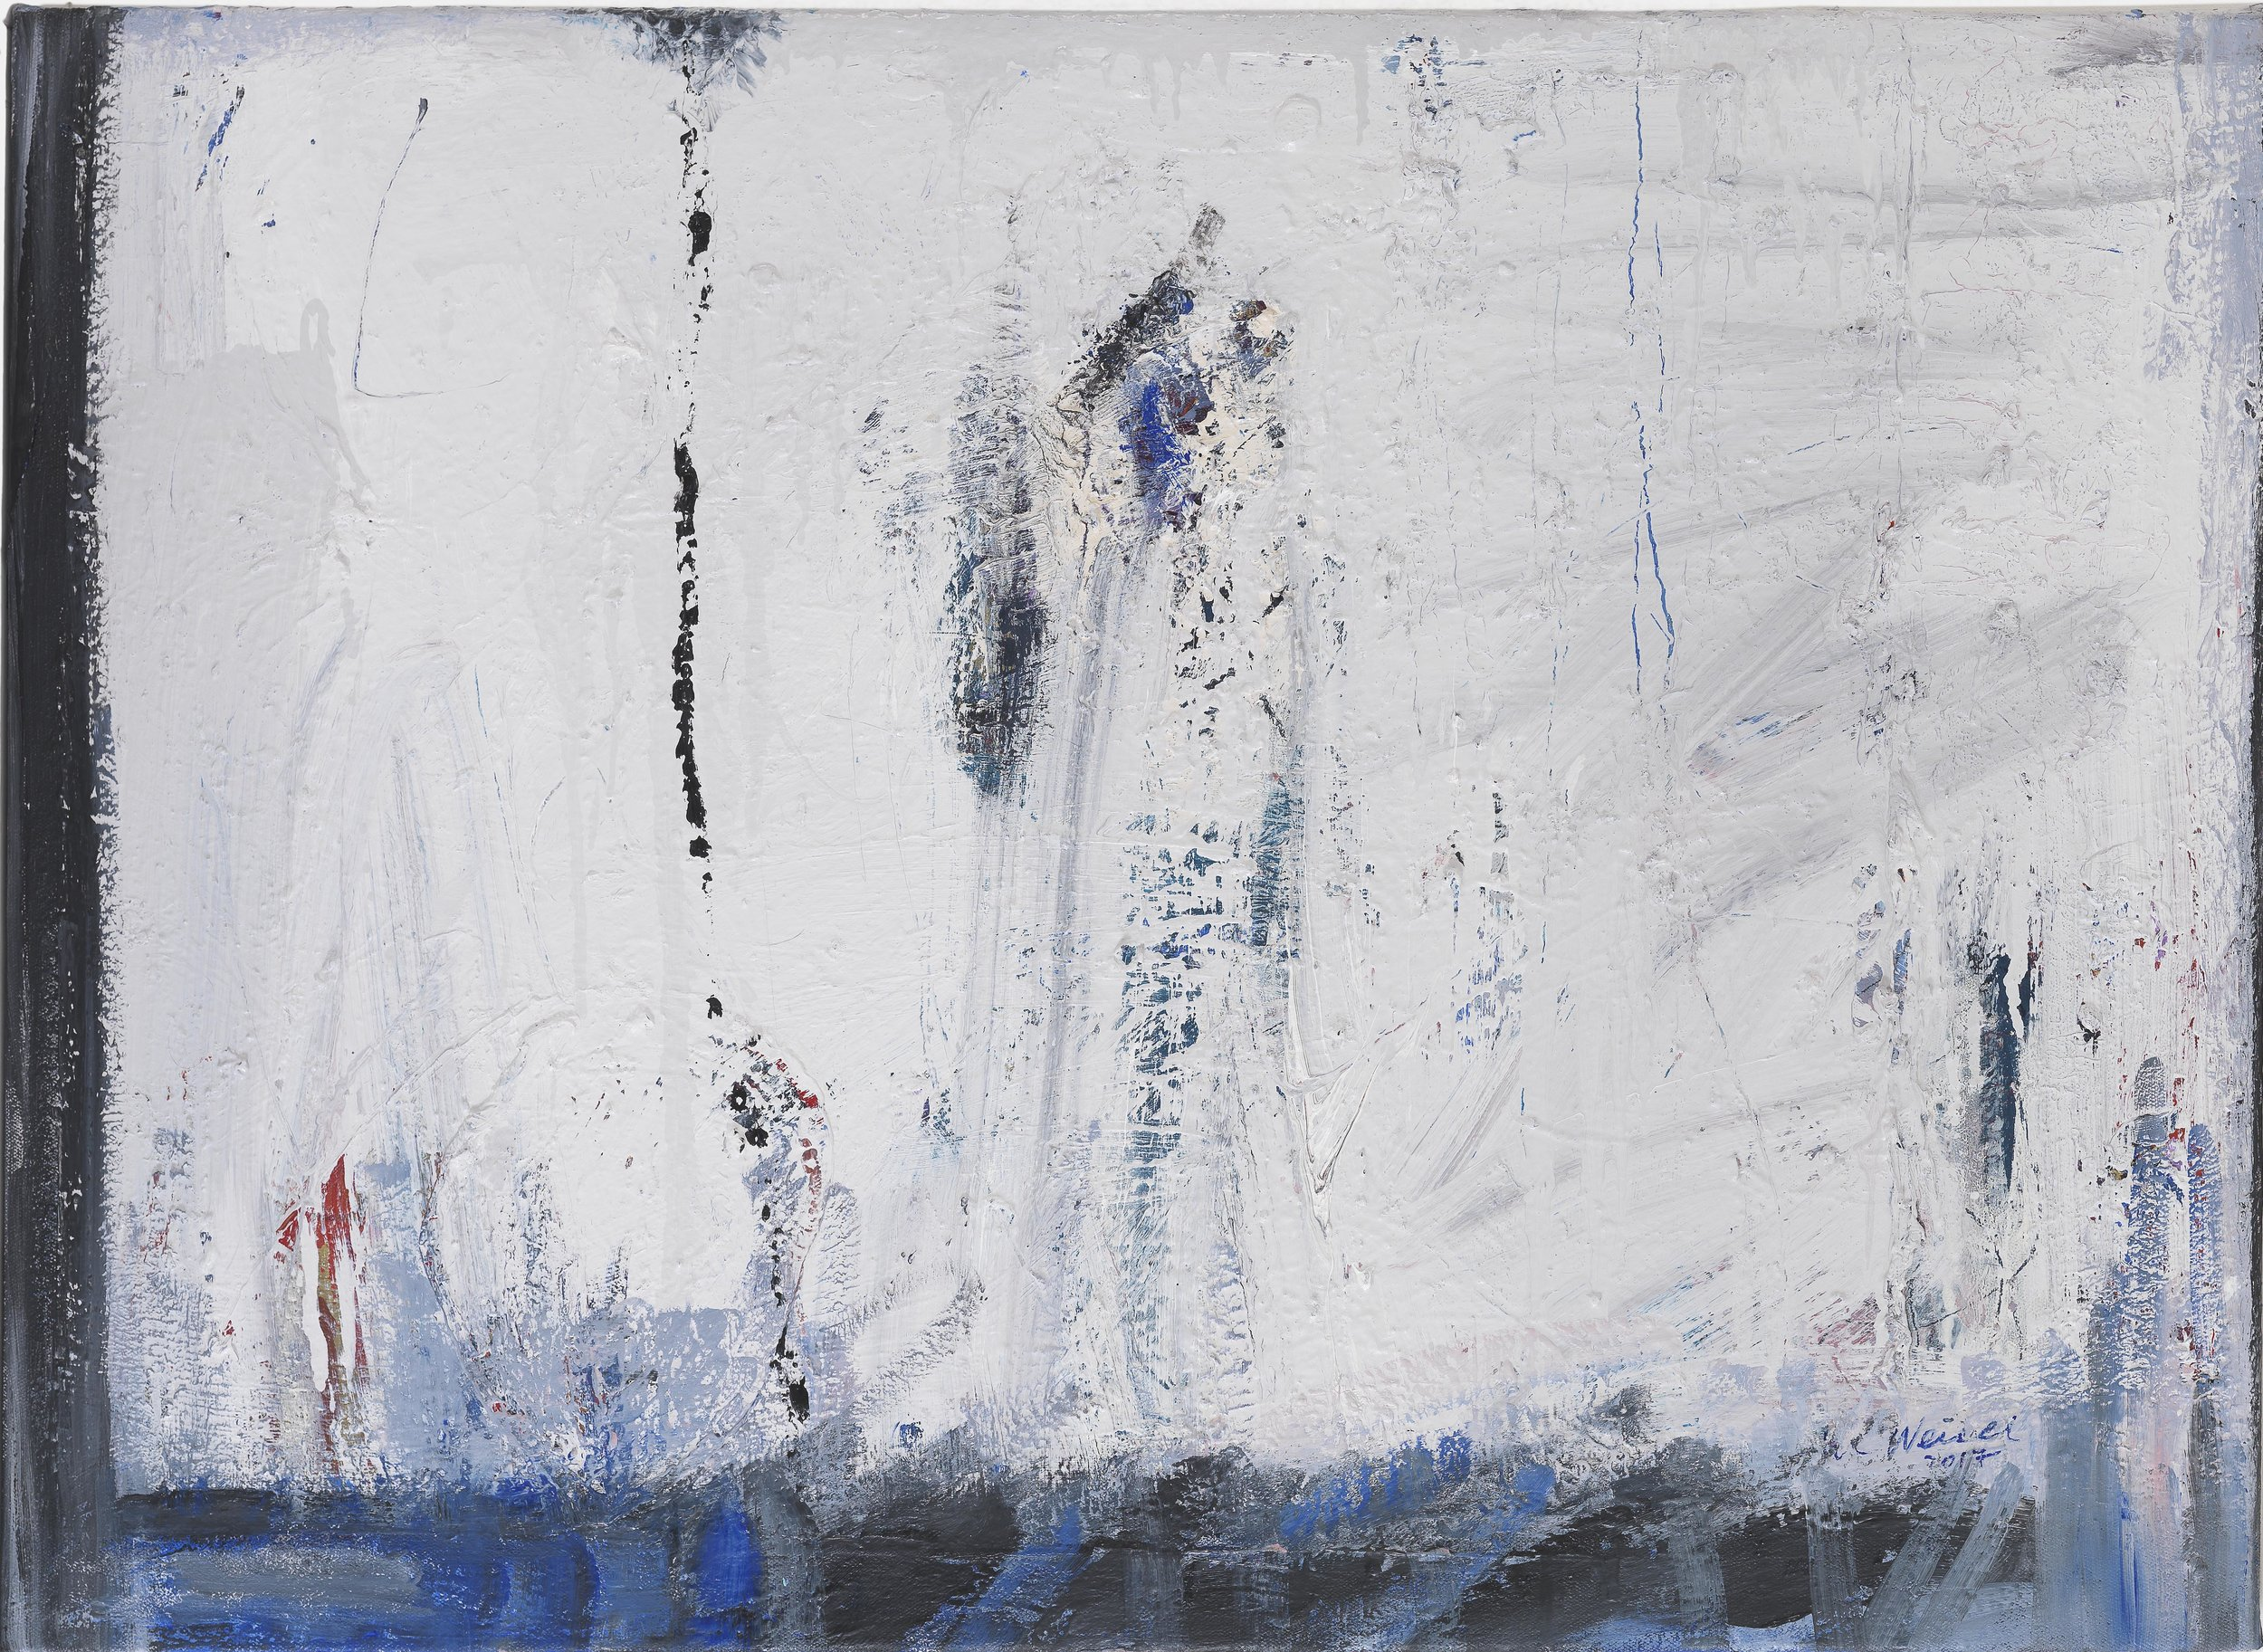 Mindy Weisel at Rosenbach Untitled